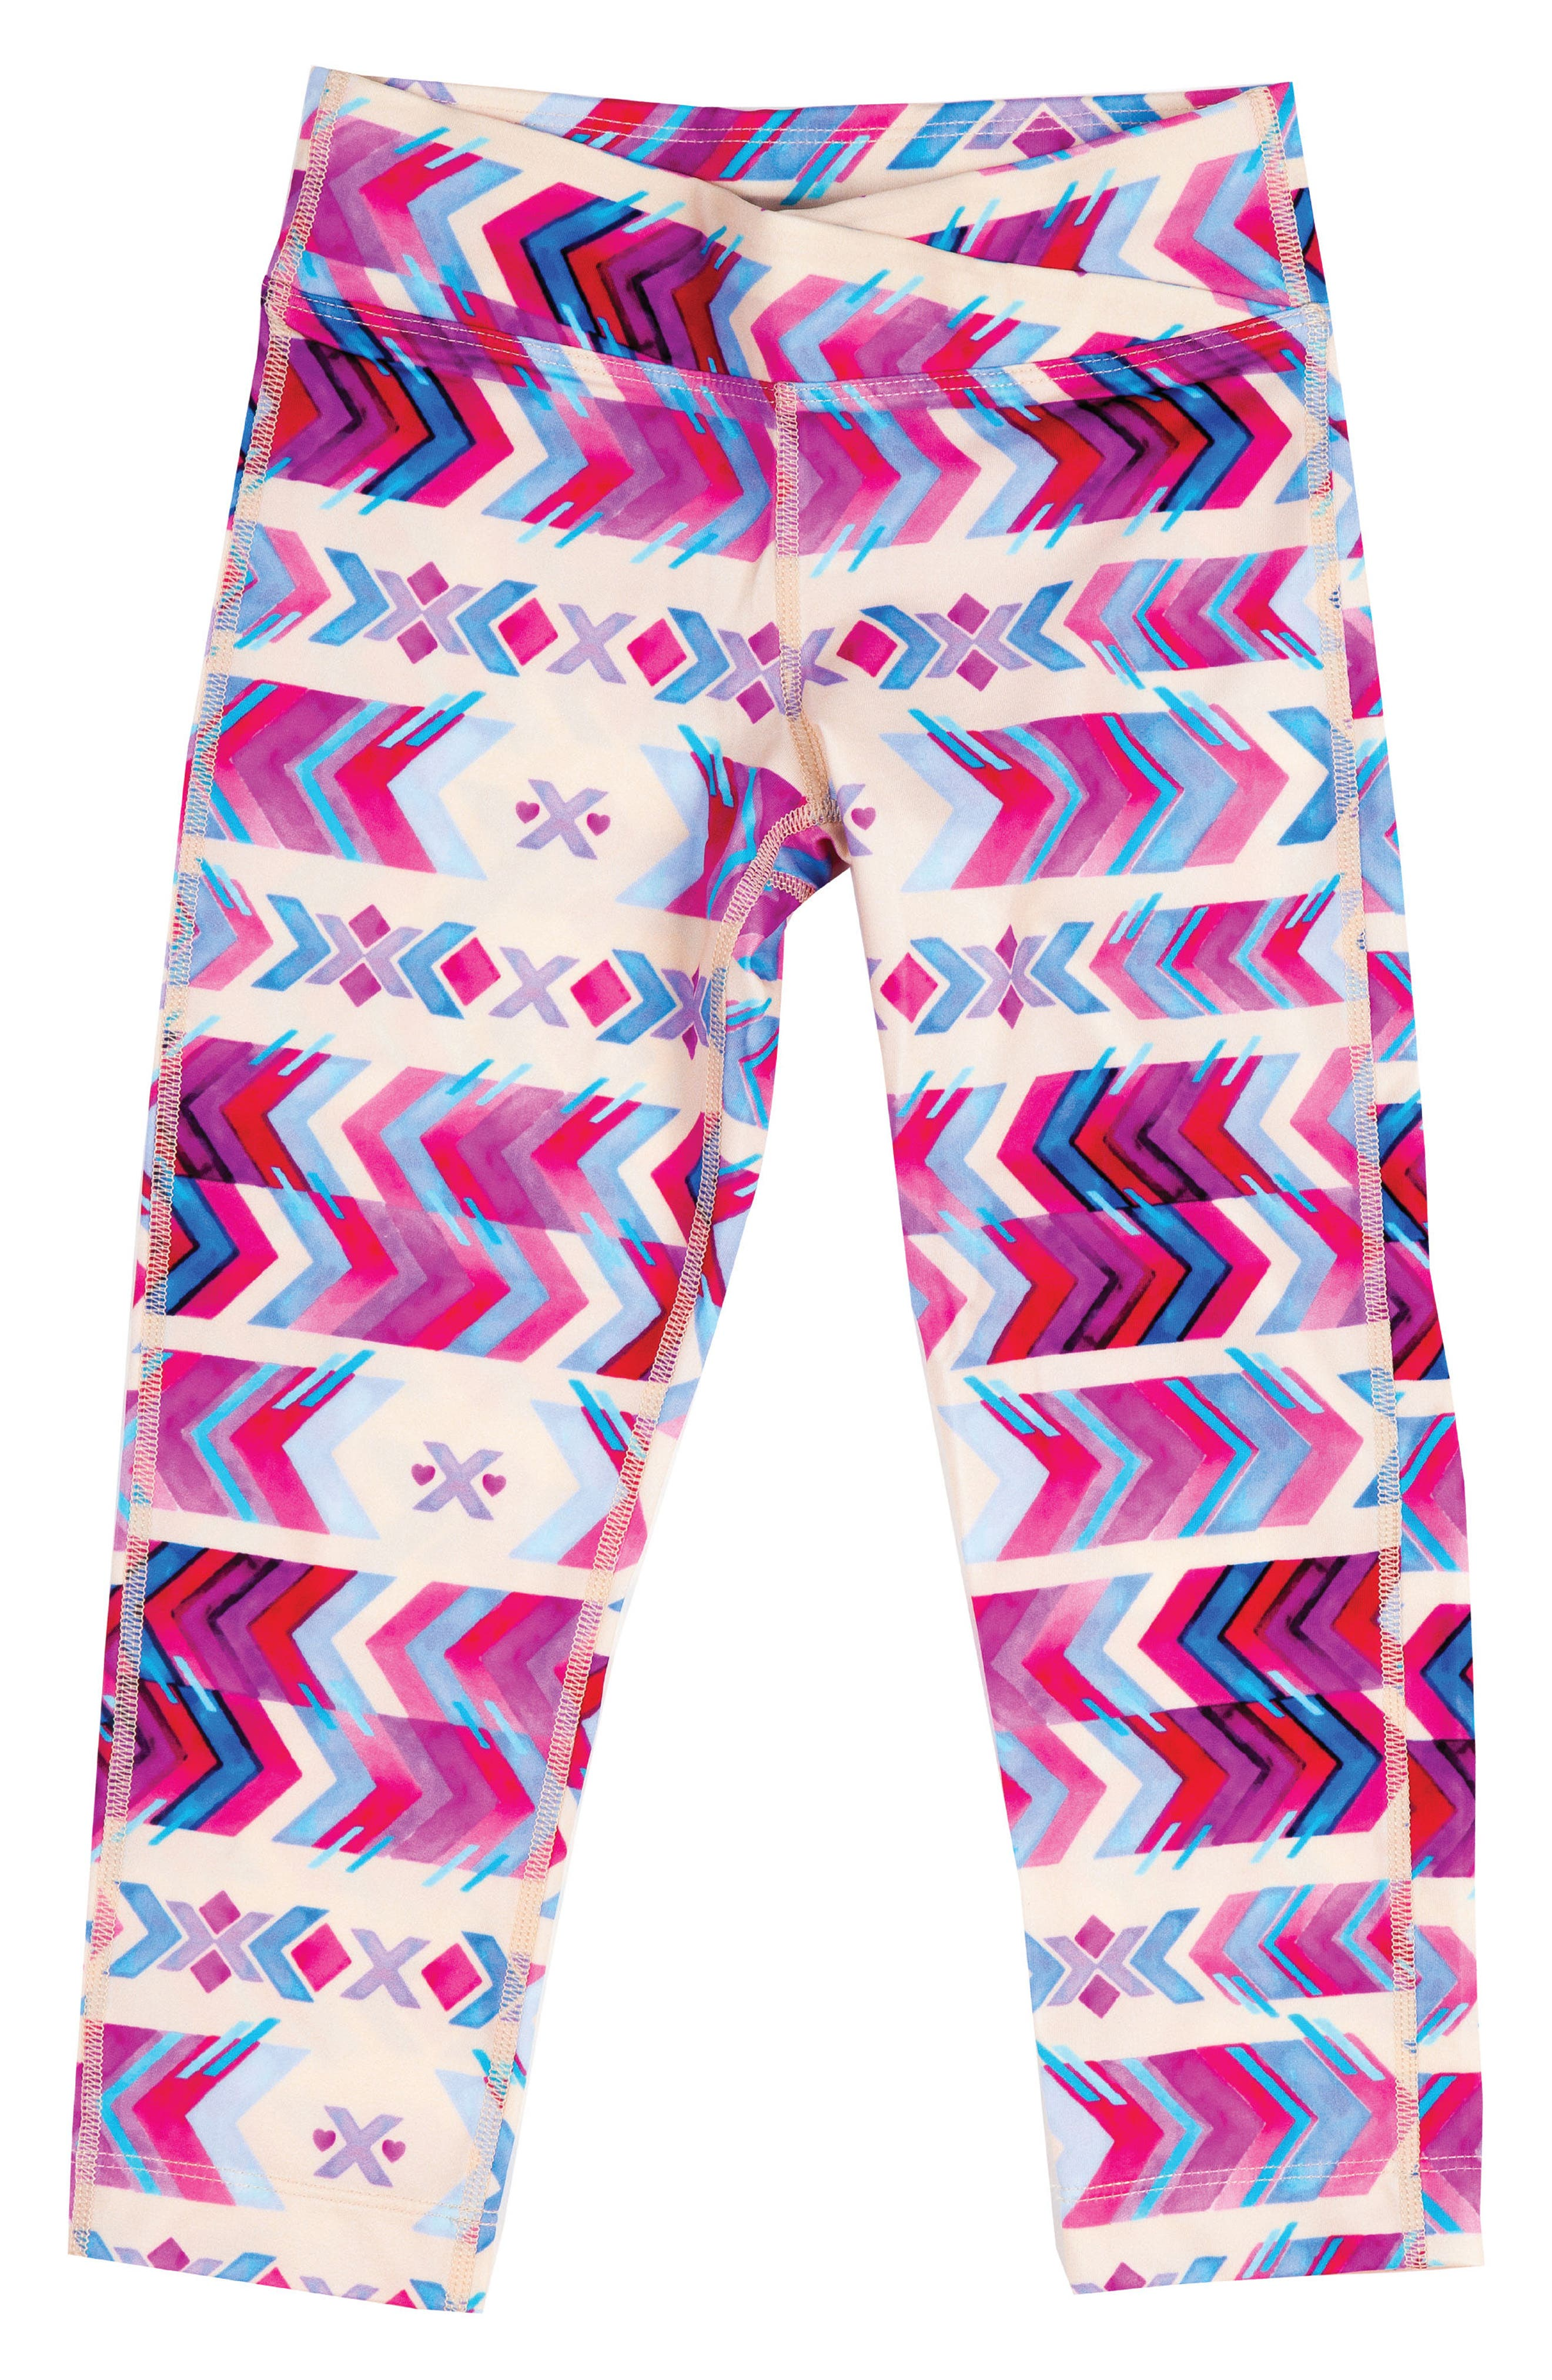 Surf's Up Swim Leggings,                             Main thumbnail 1, color,                             Cream/ Pink Aztec Print